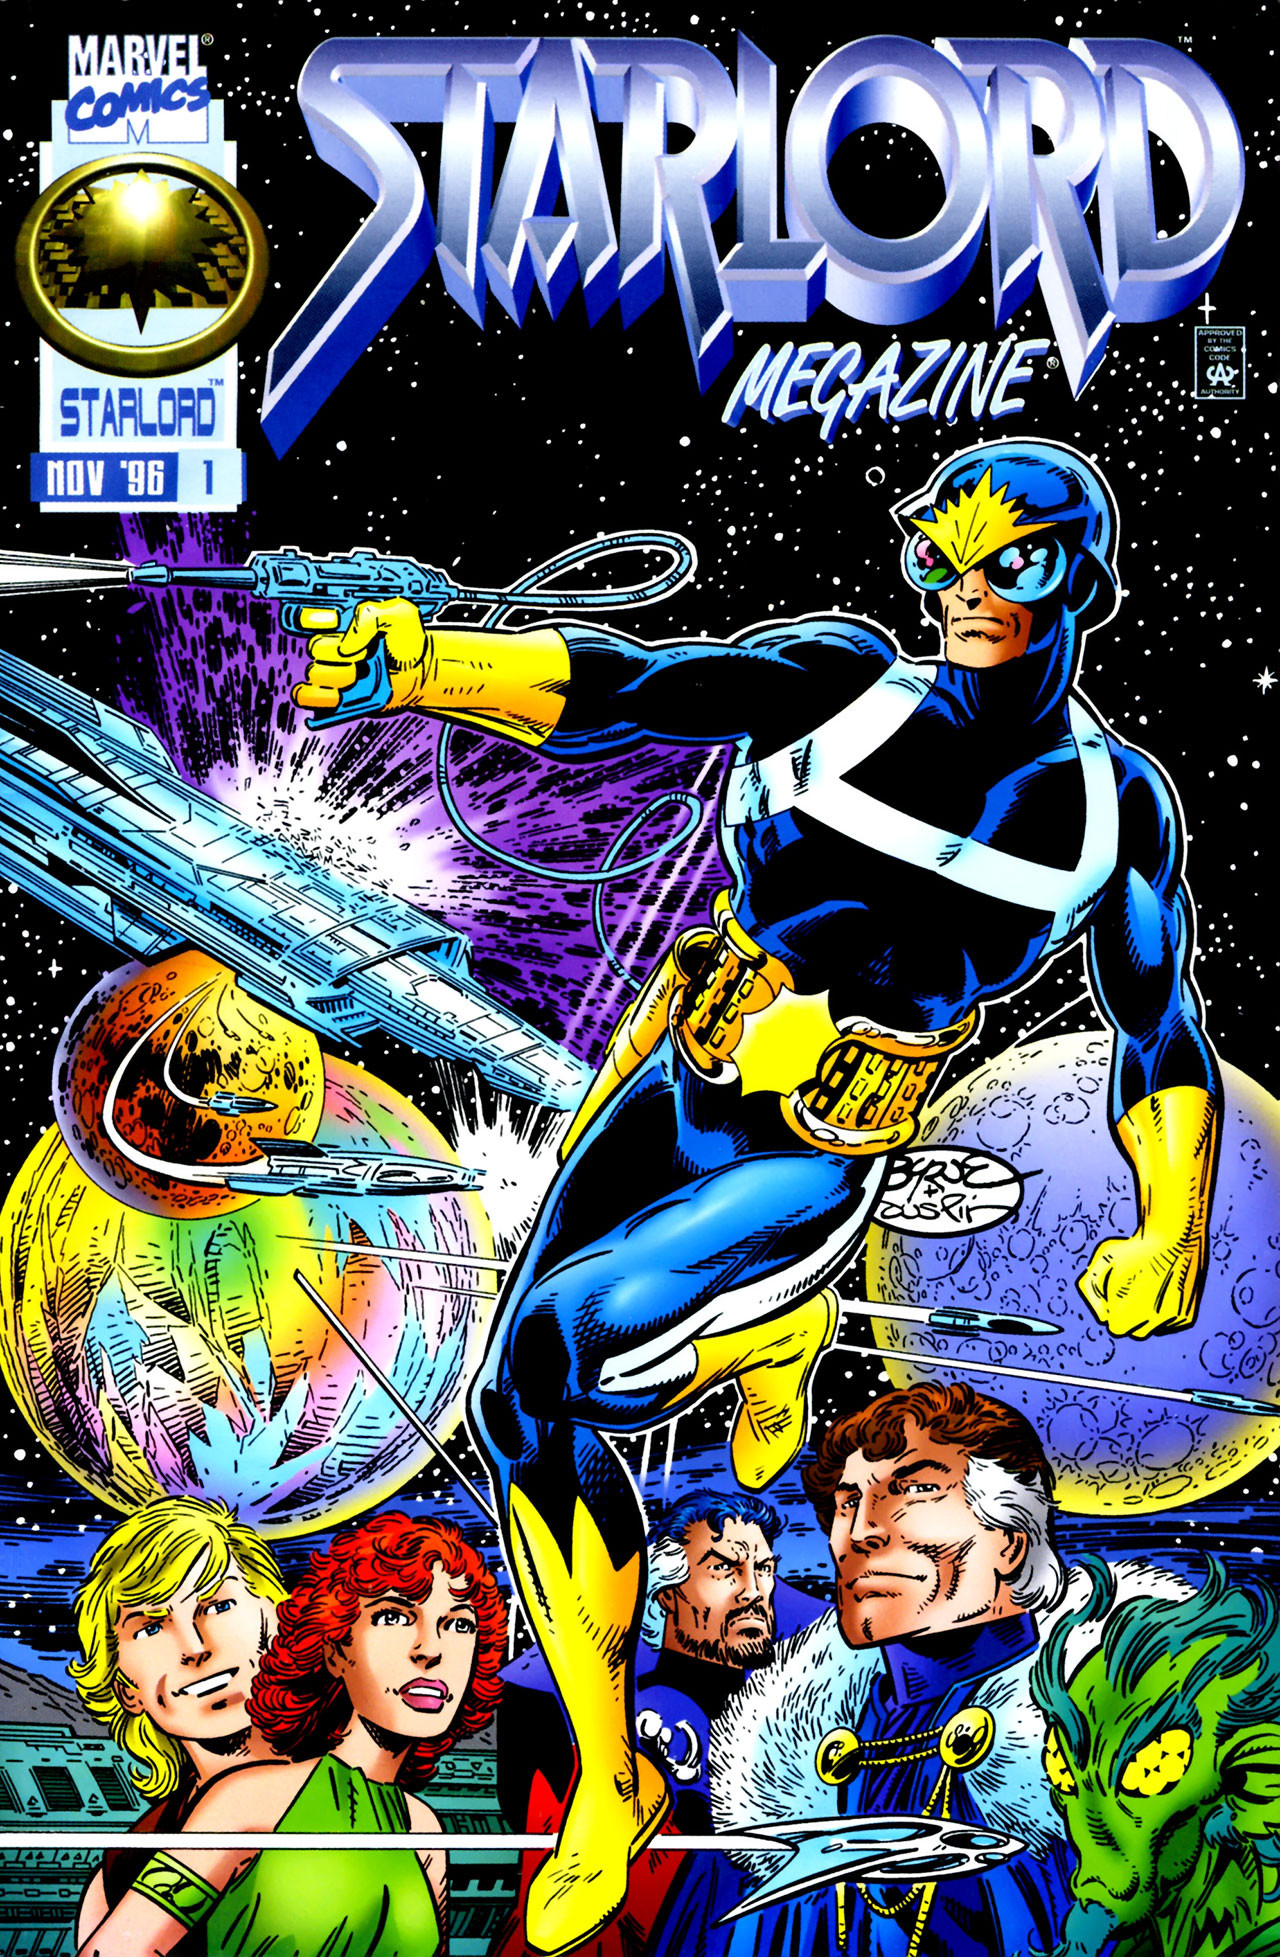 Starlord Megazine Vol 1 1 | Marvel Database | FANDOM ...